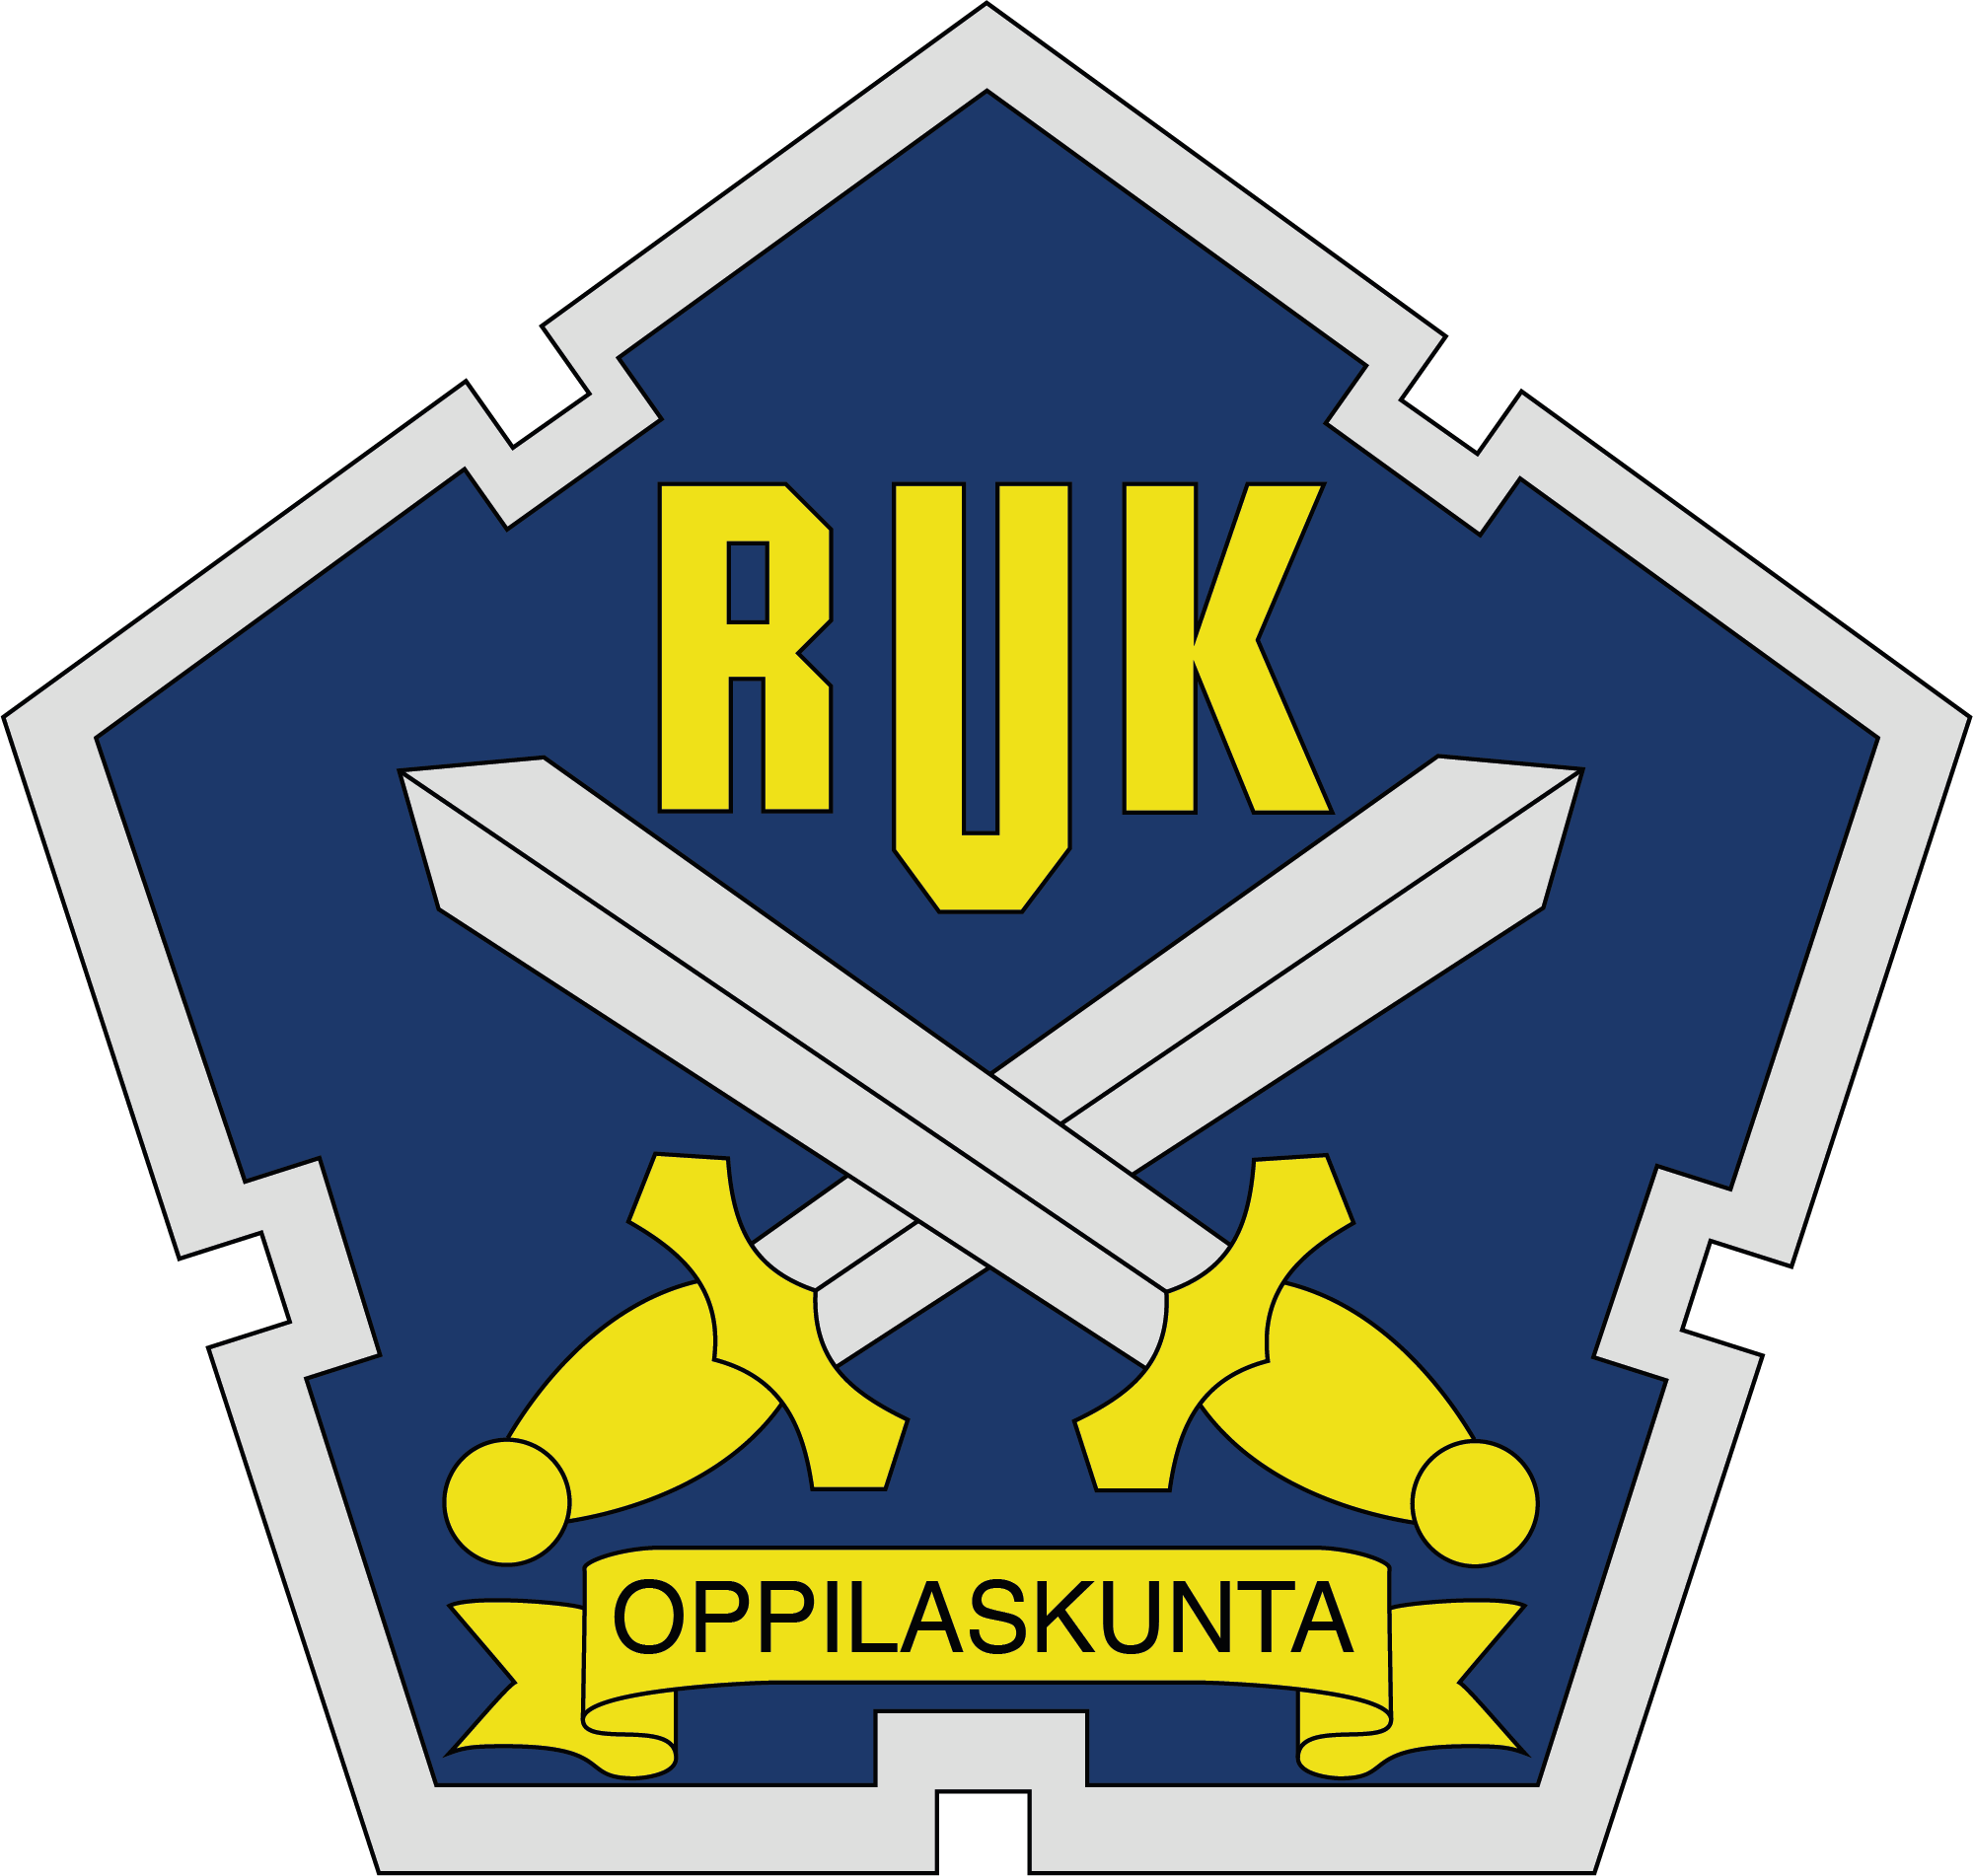 Oppilaskunnan logo